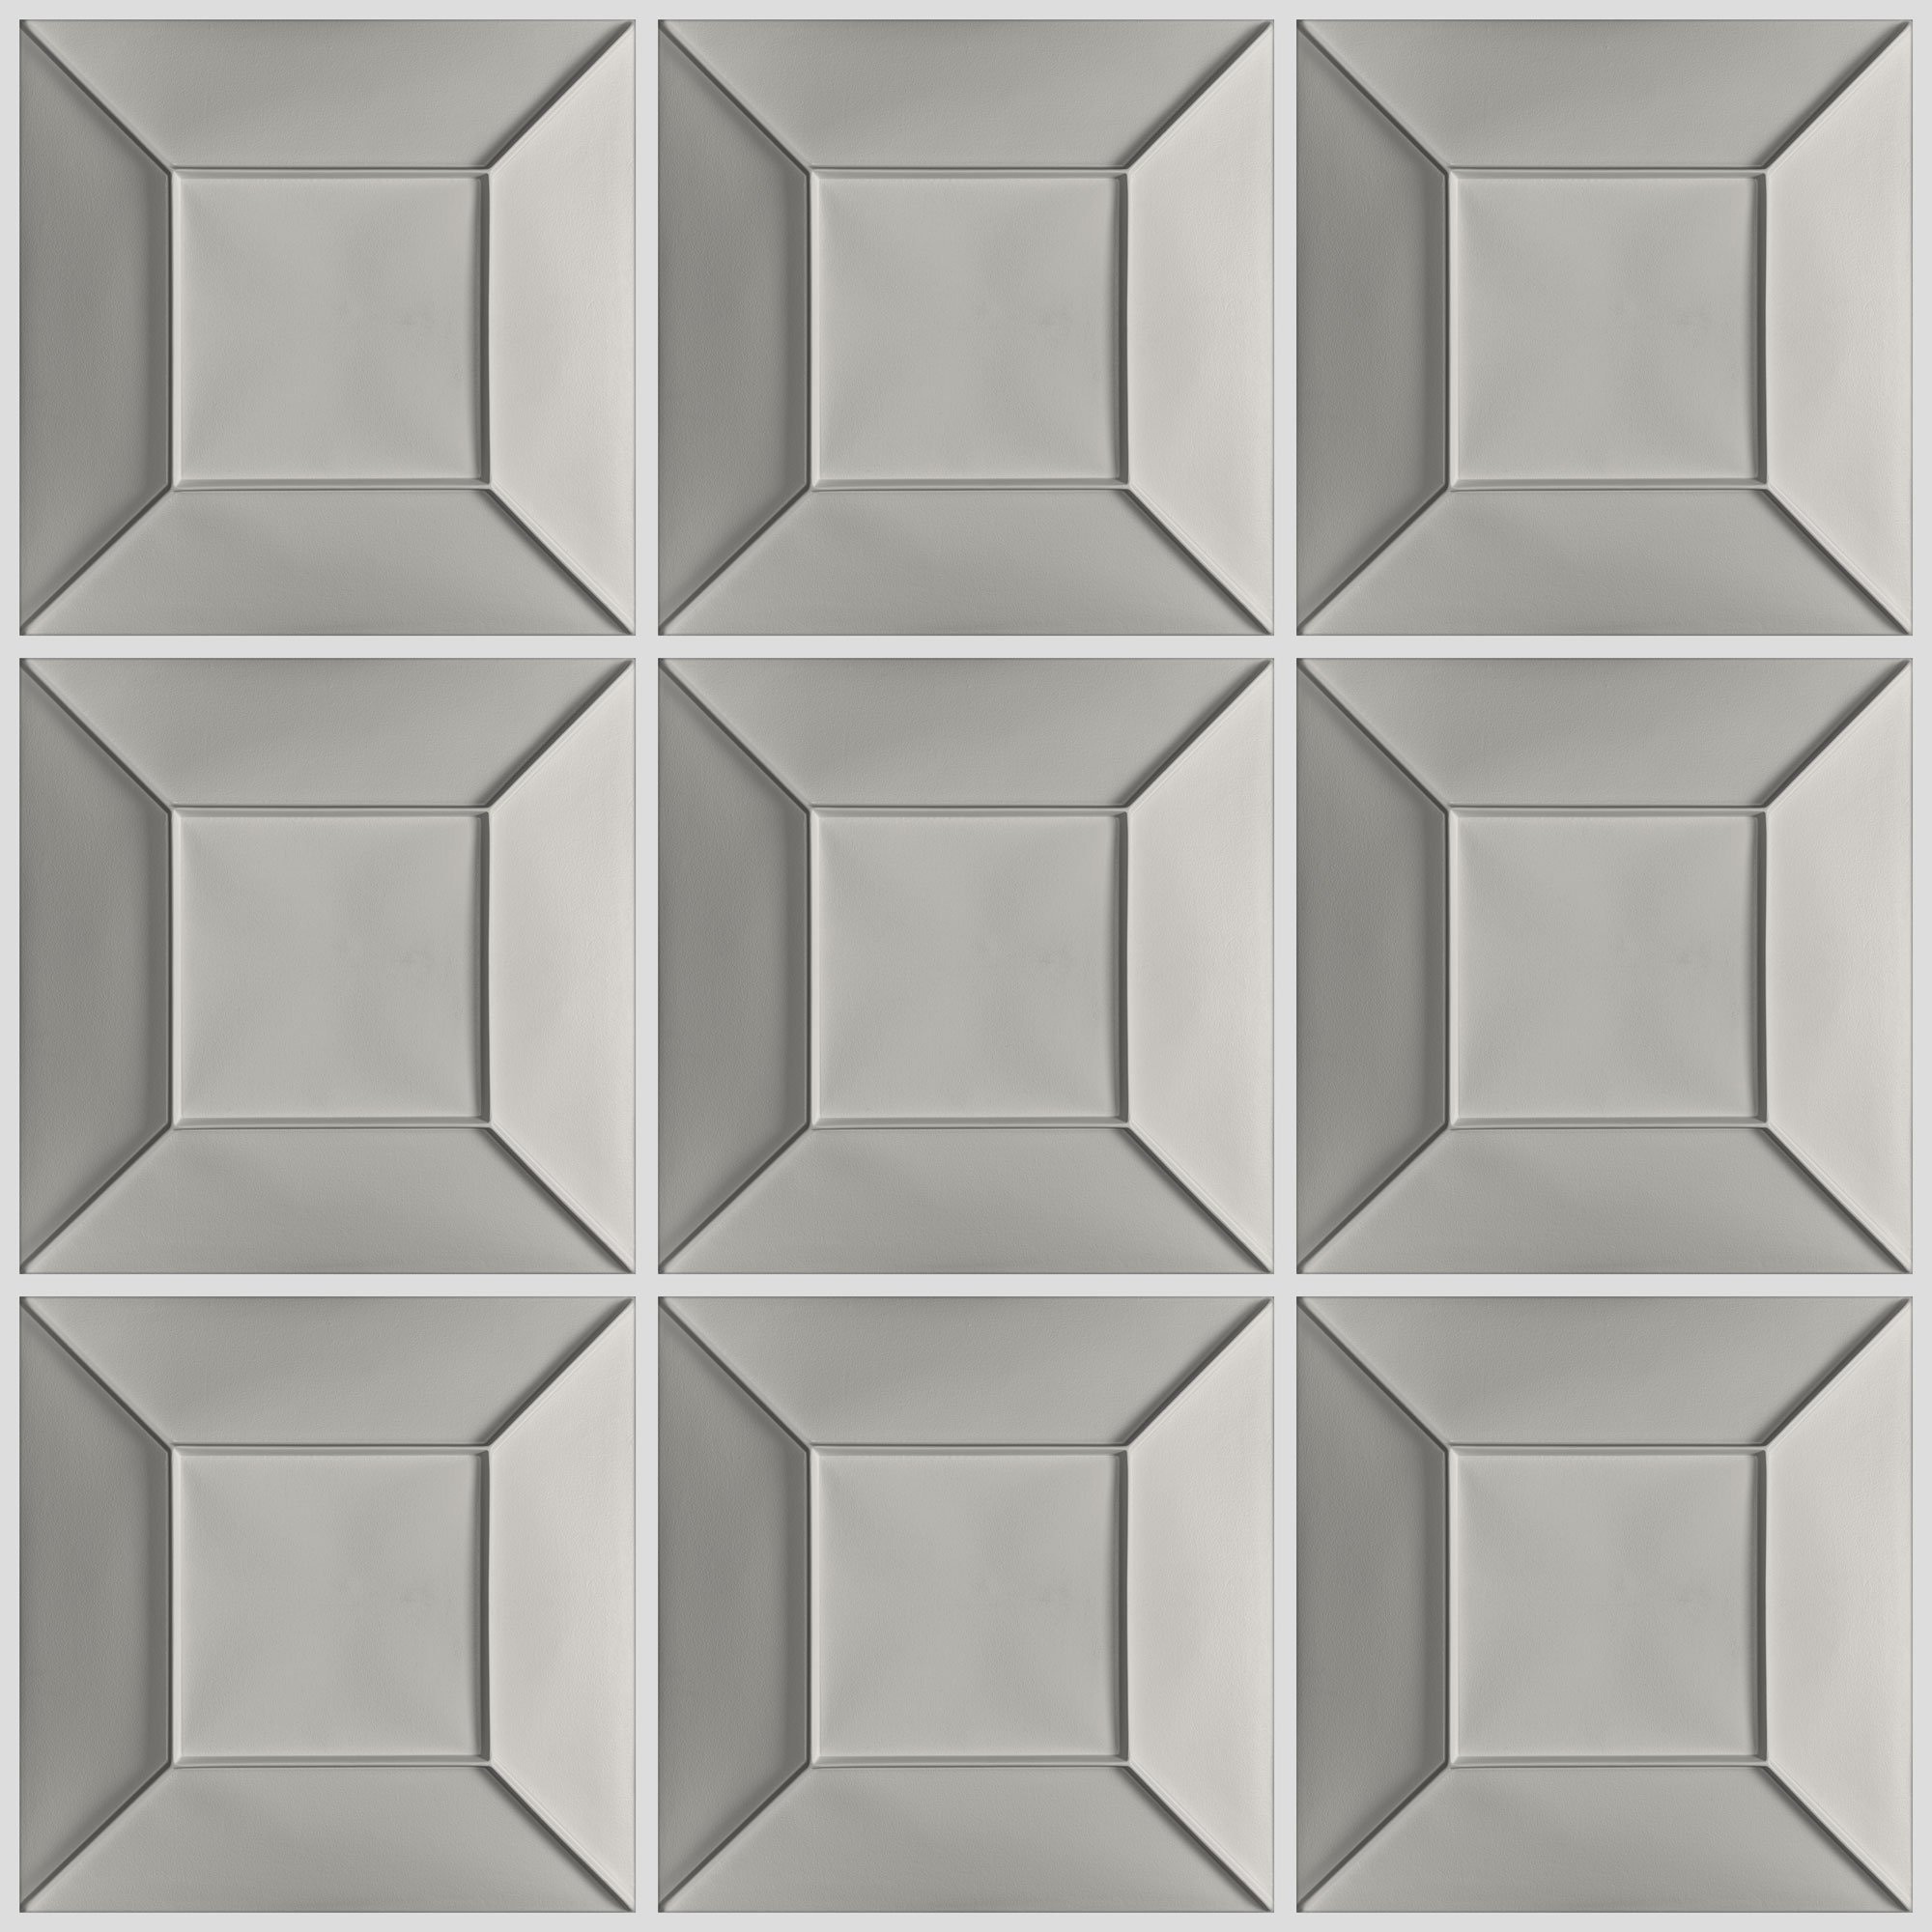 Convex Ceiling Tiles